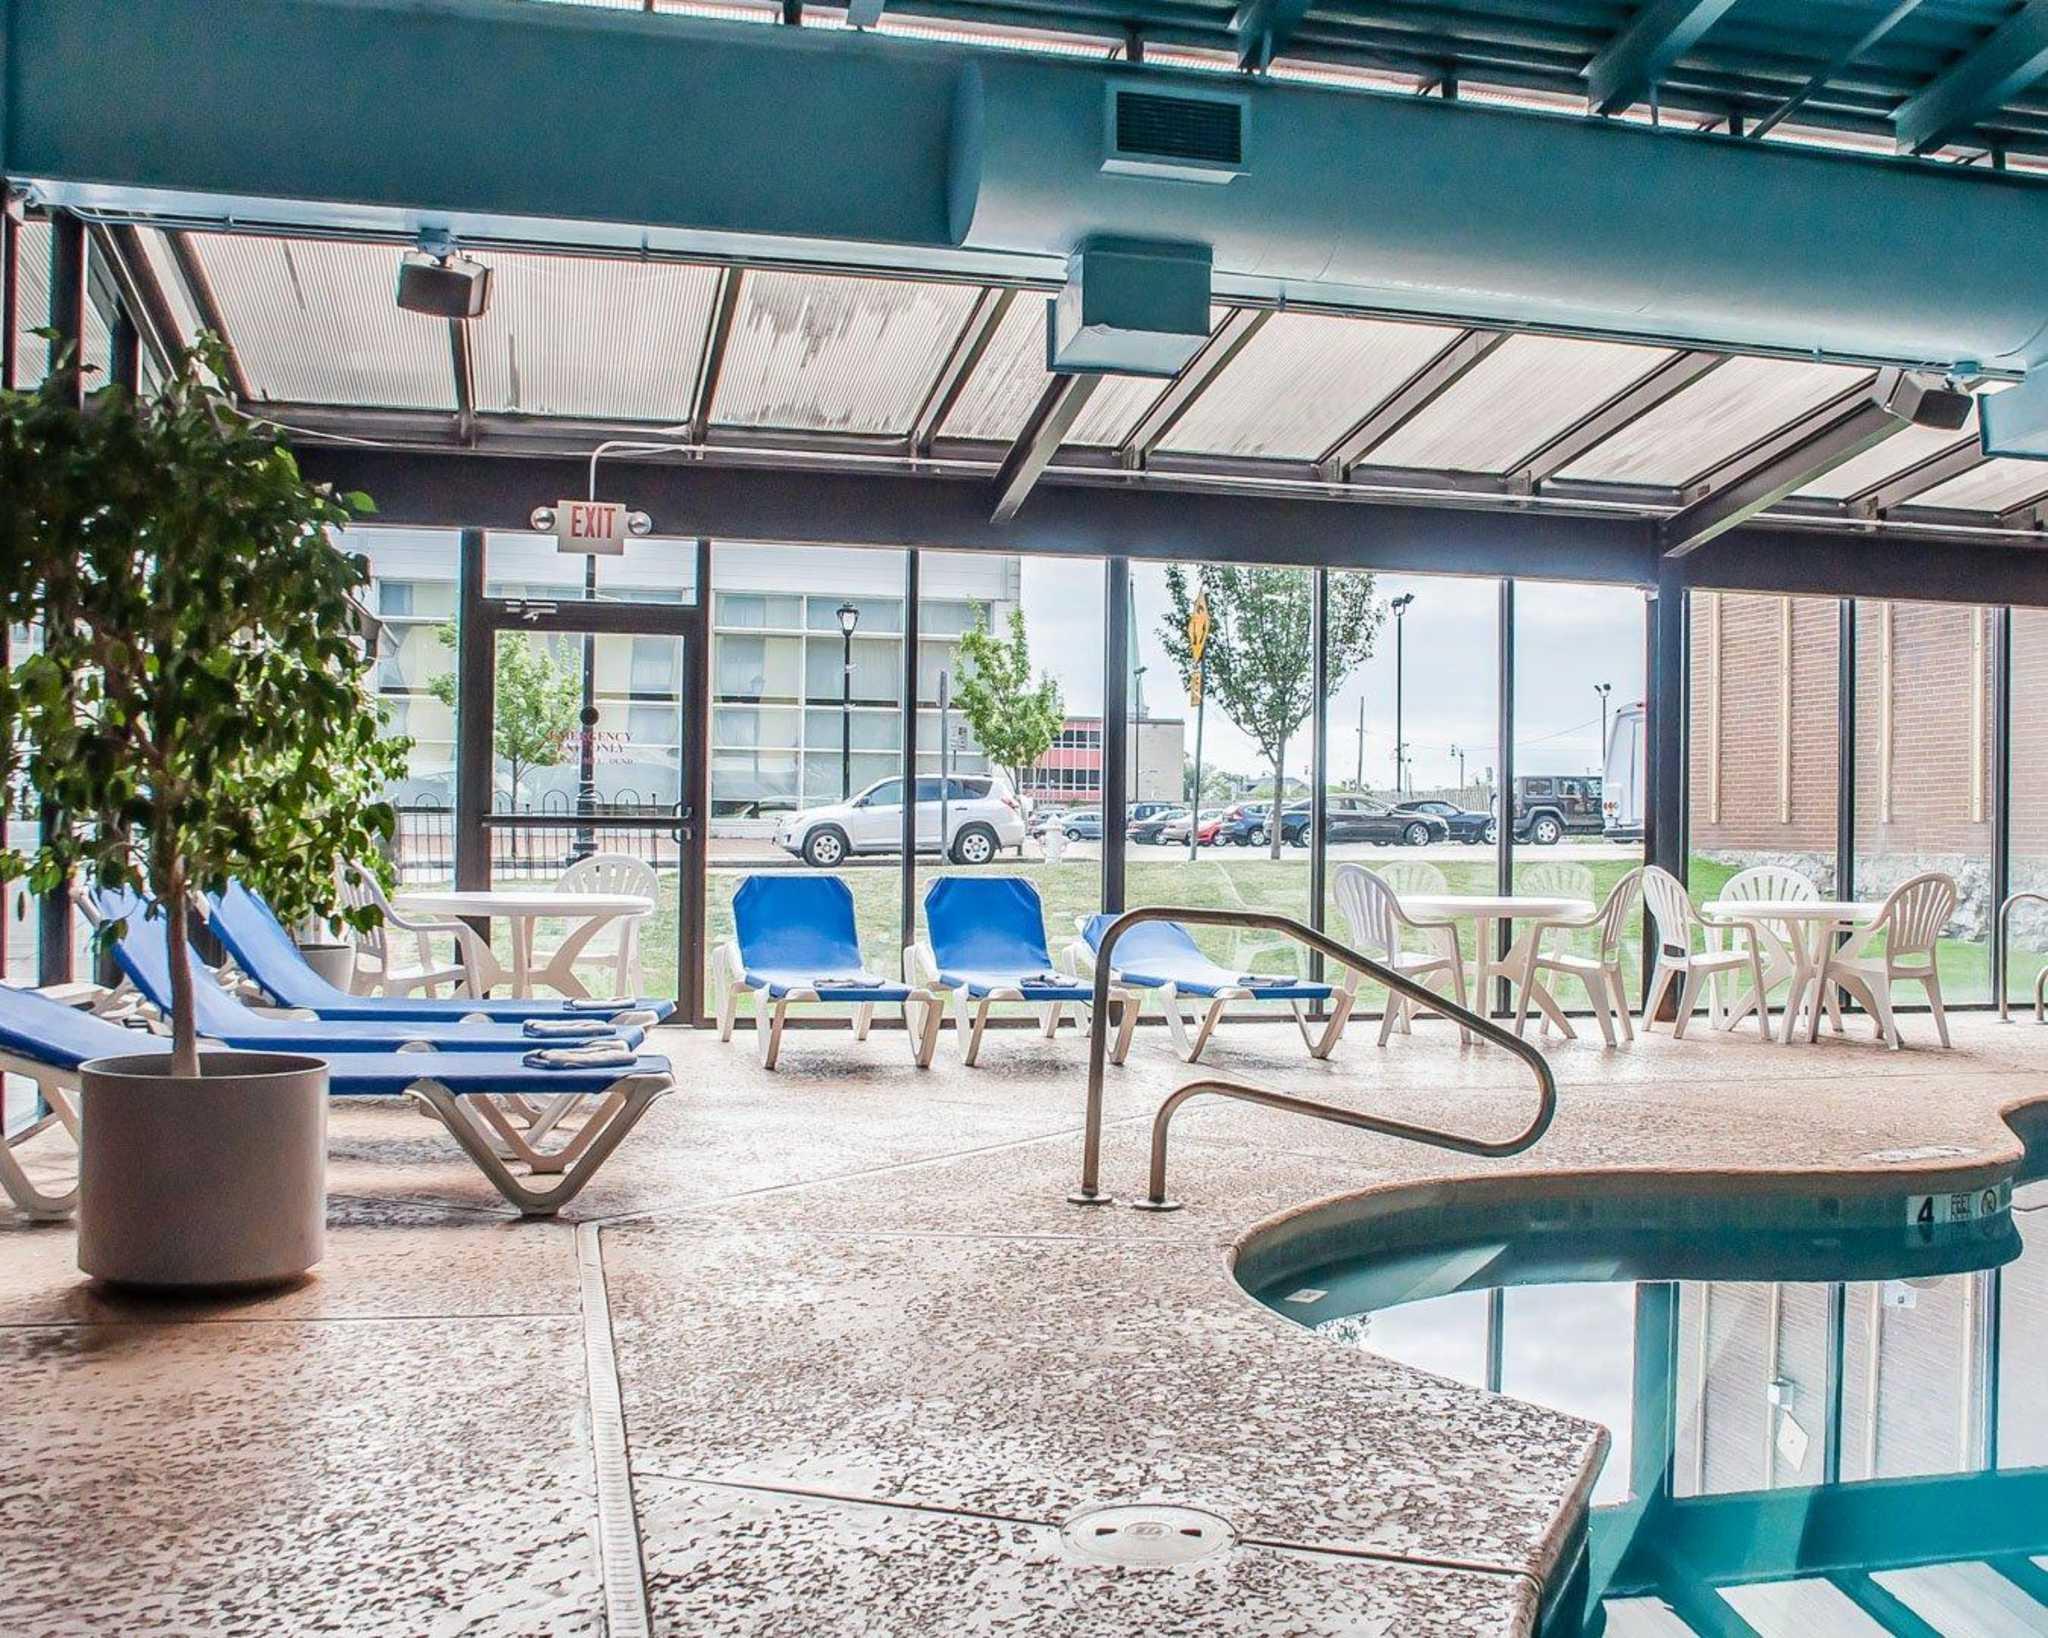 Niagara Falls Ny Hotels With Hot Tub In Room